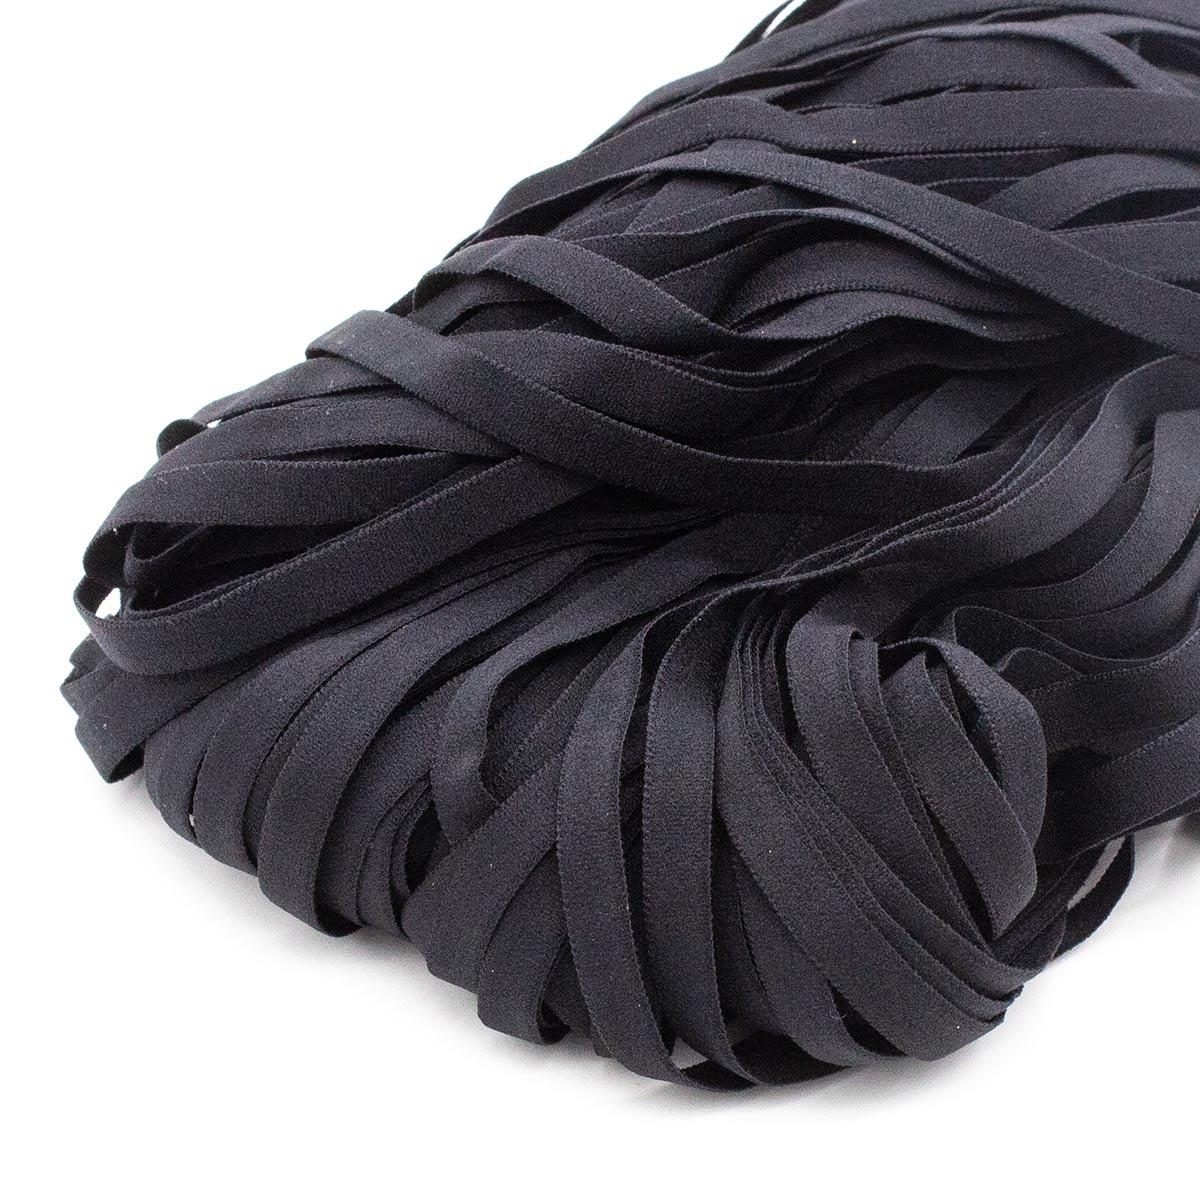 STB/17 эластичная отделочная лента 6мм*50м, черный